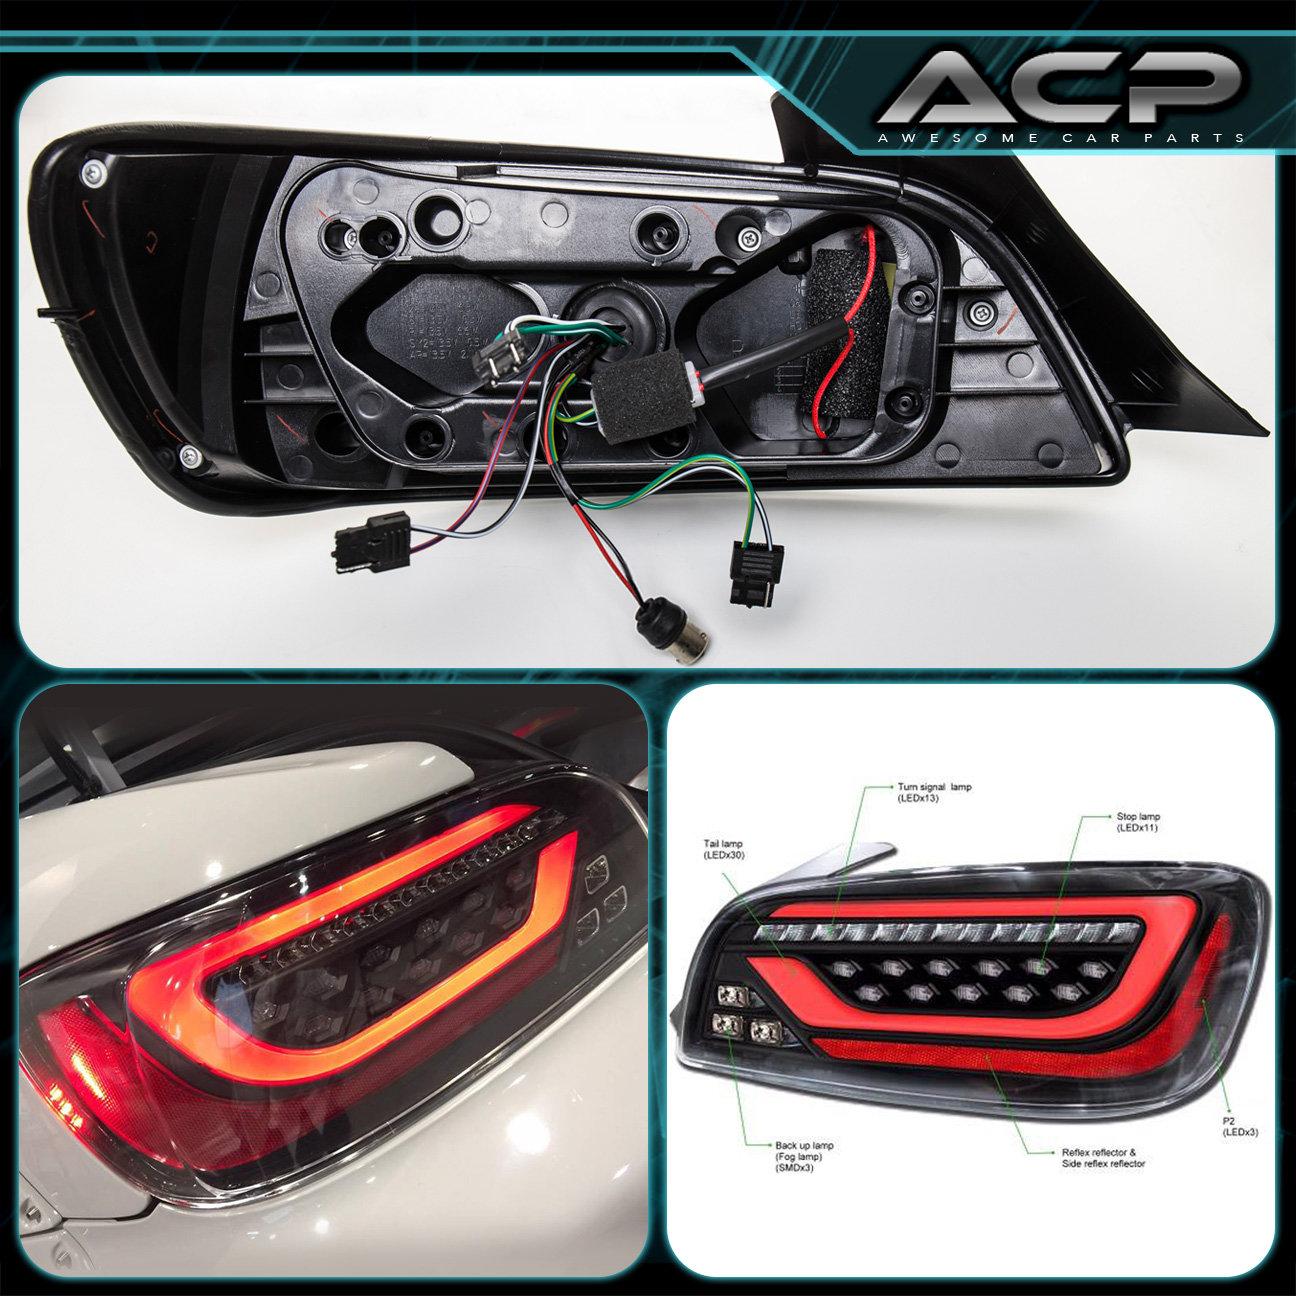 Depo Black Housing Clear Lens Led Tail Lights Assembly For 00-09 S2000 Ap1 Ap2 | eBay